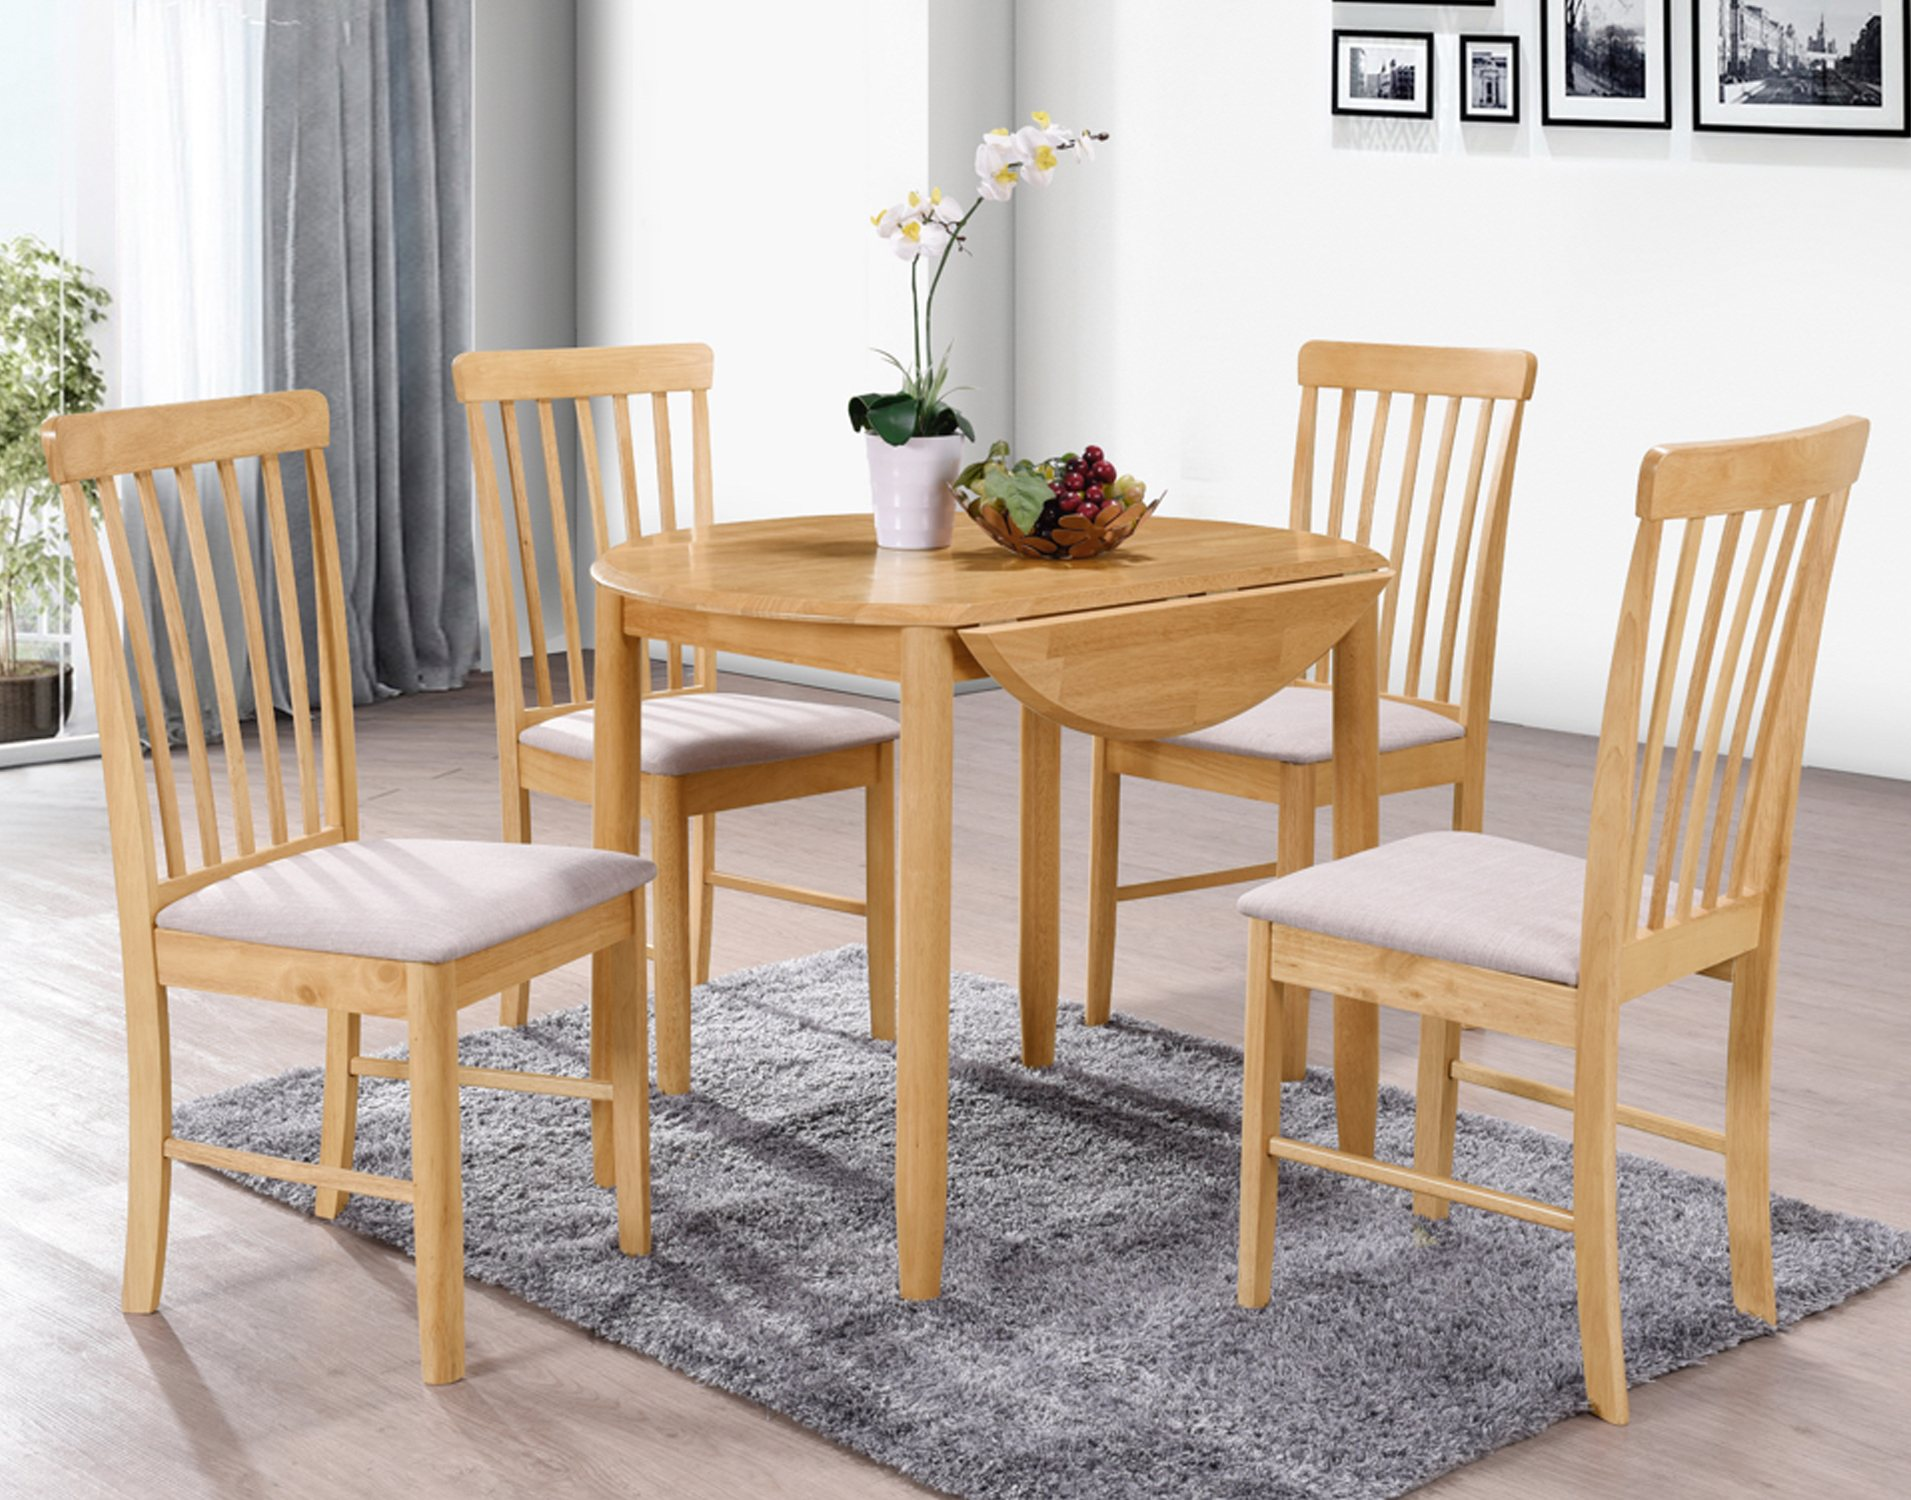 Alaska Oak Round Drop Leaf Dining Table Set & 9 Chairs